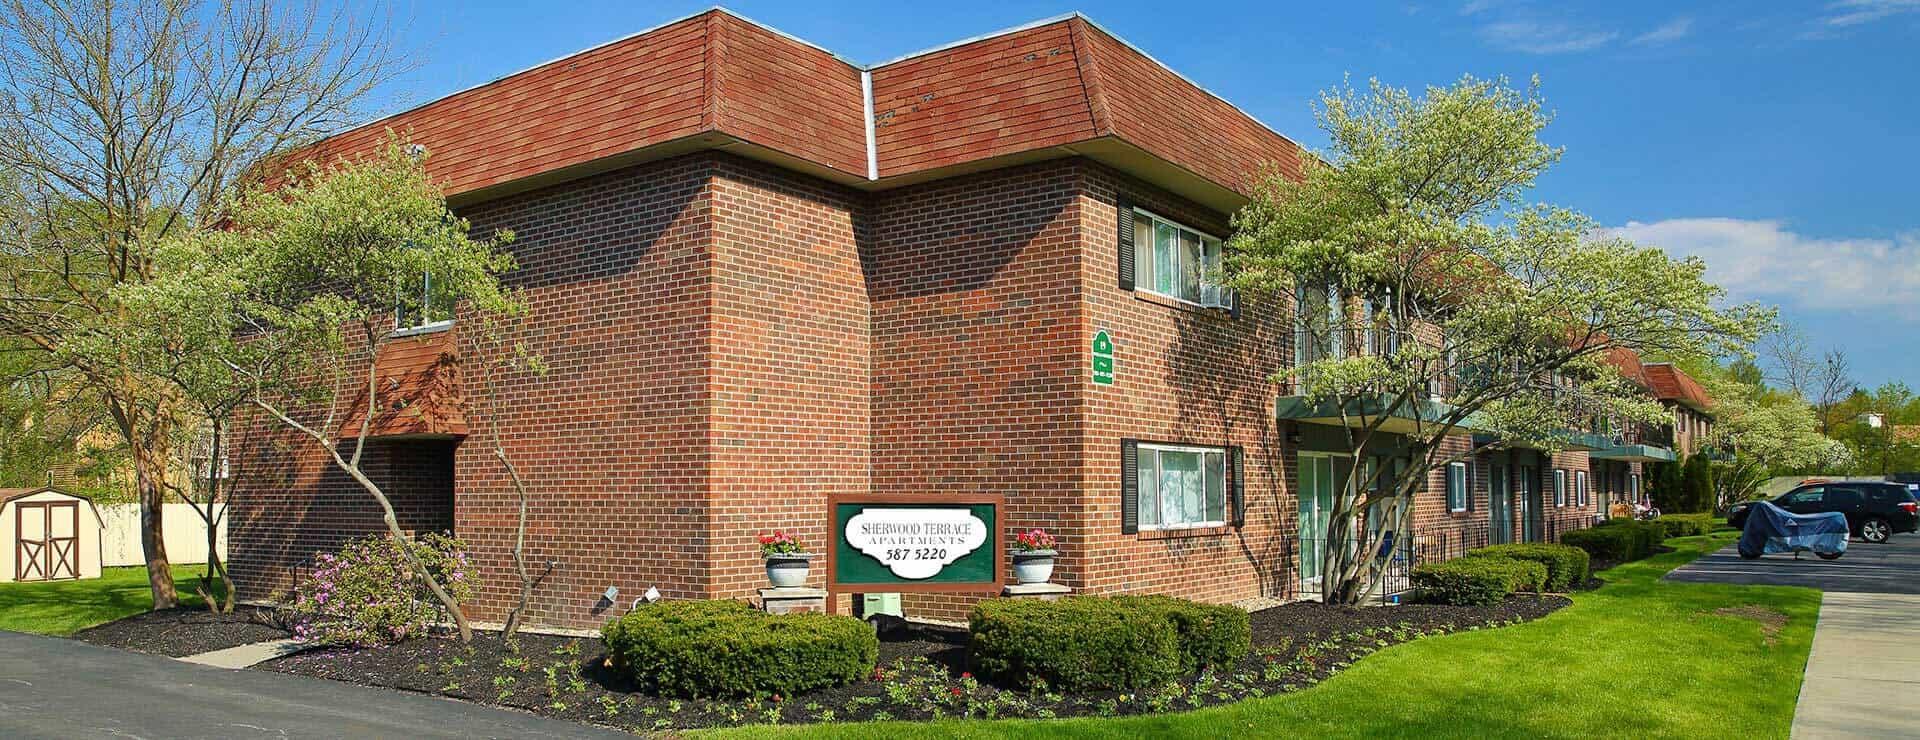 Burns Management | Sherwood Terrace Saratoga Rent